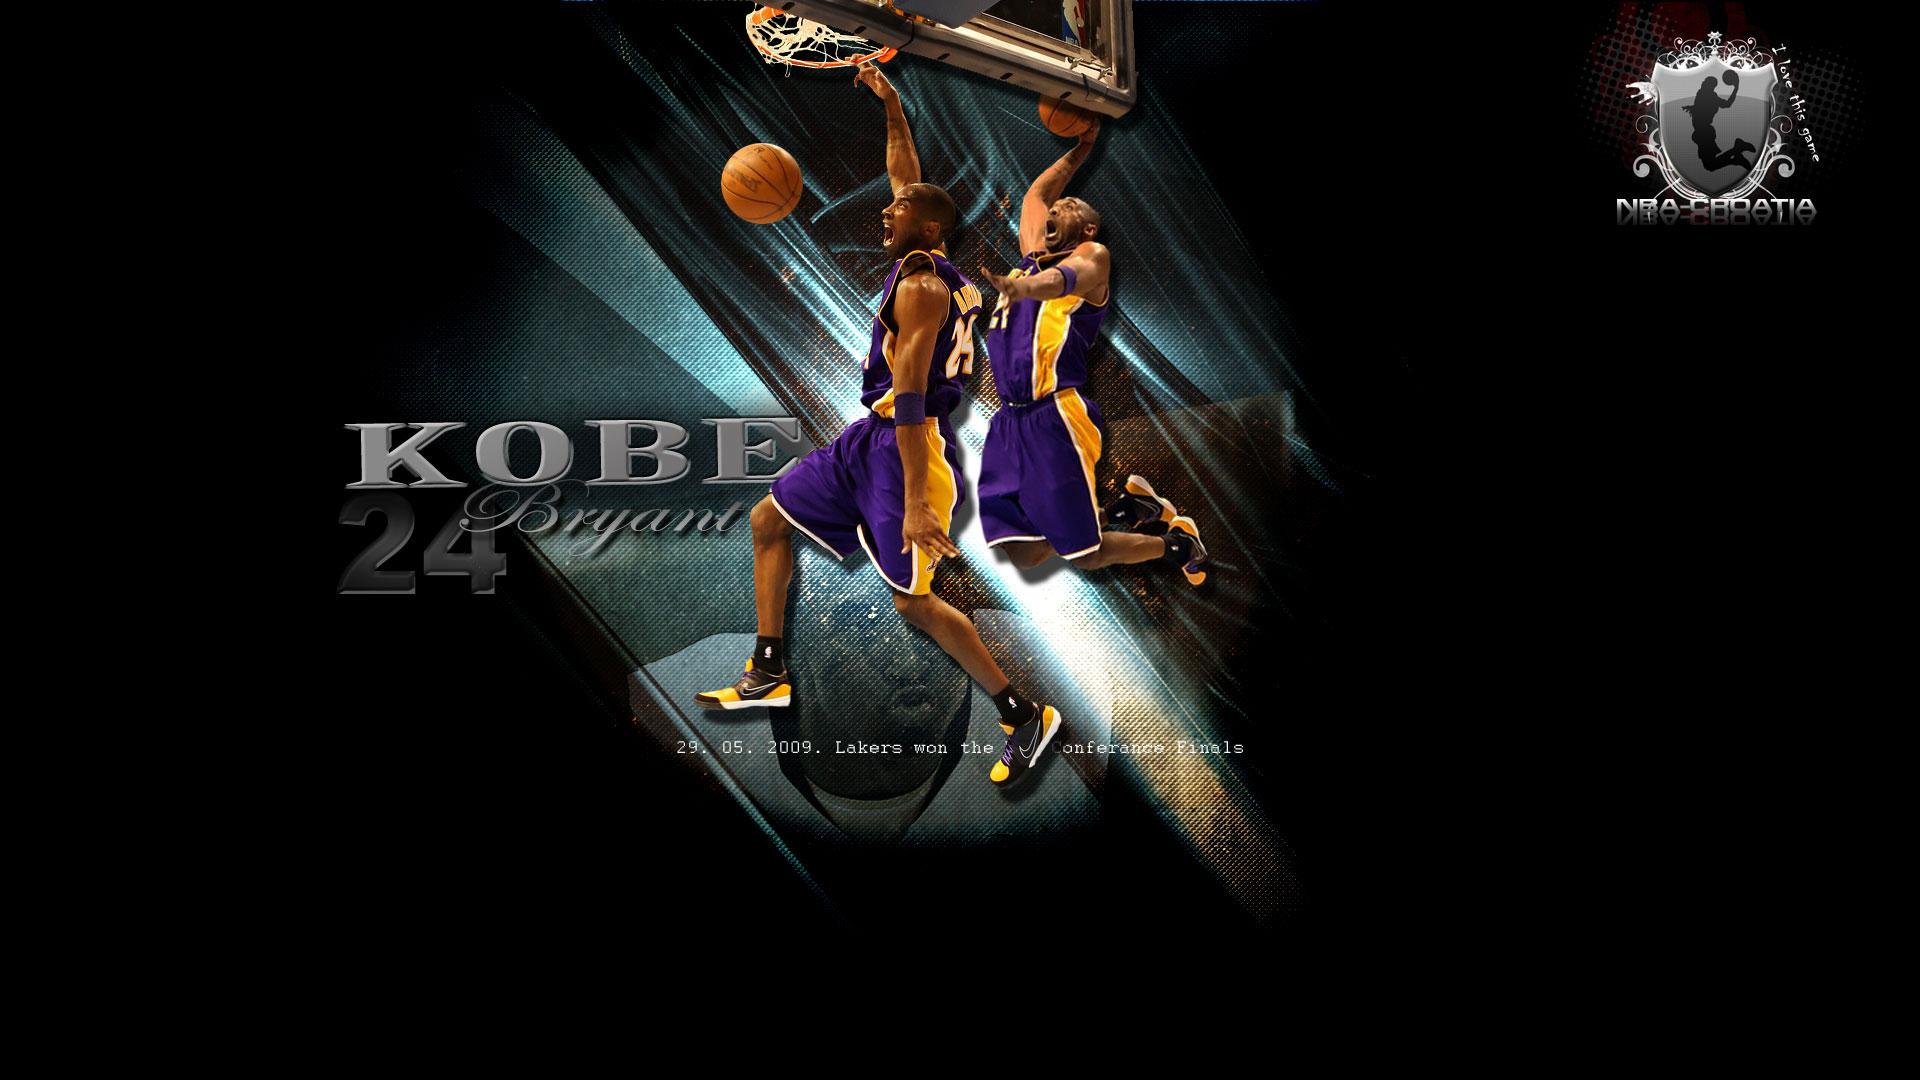 Hd Desktop Wallpapers Lakers Great World 1920x1080